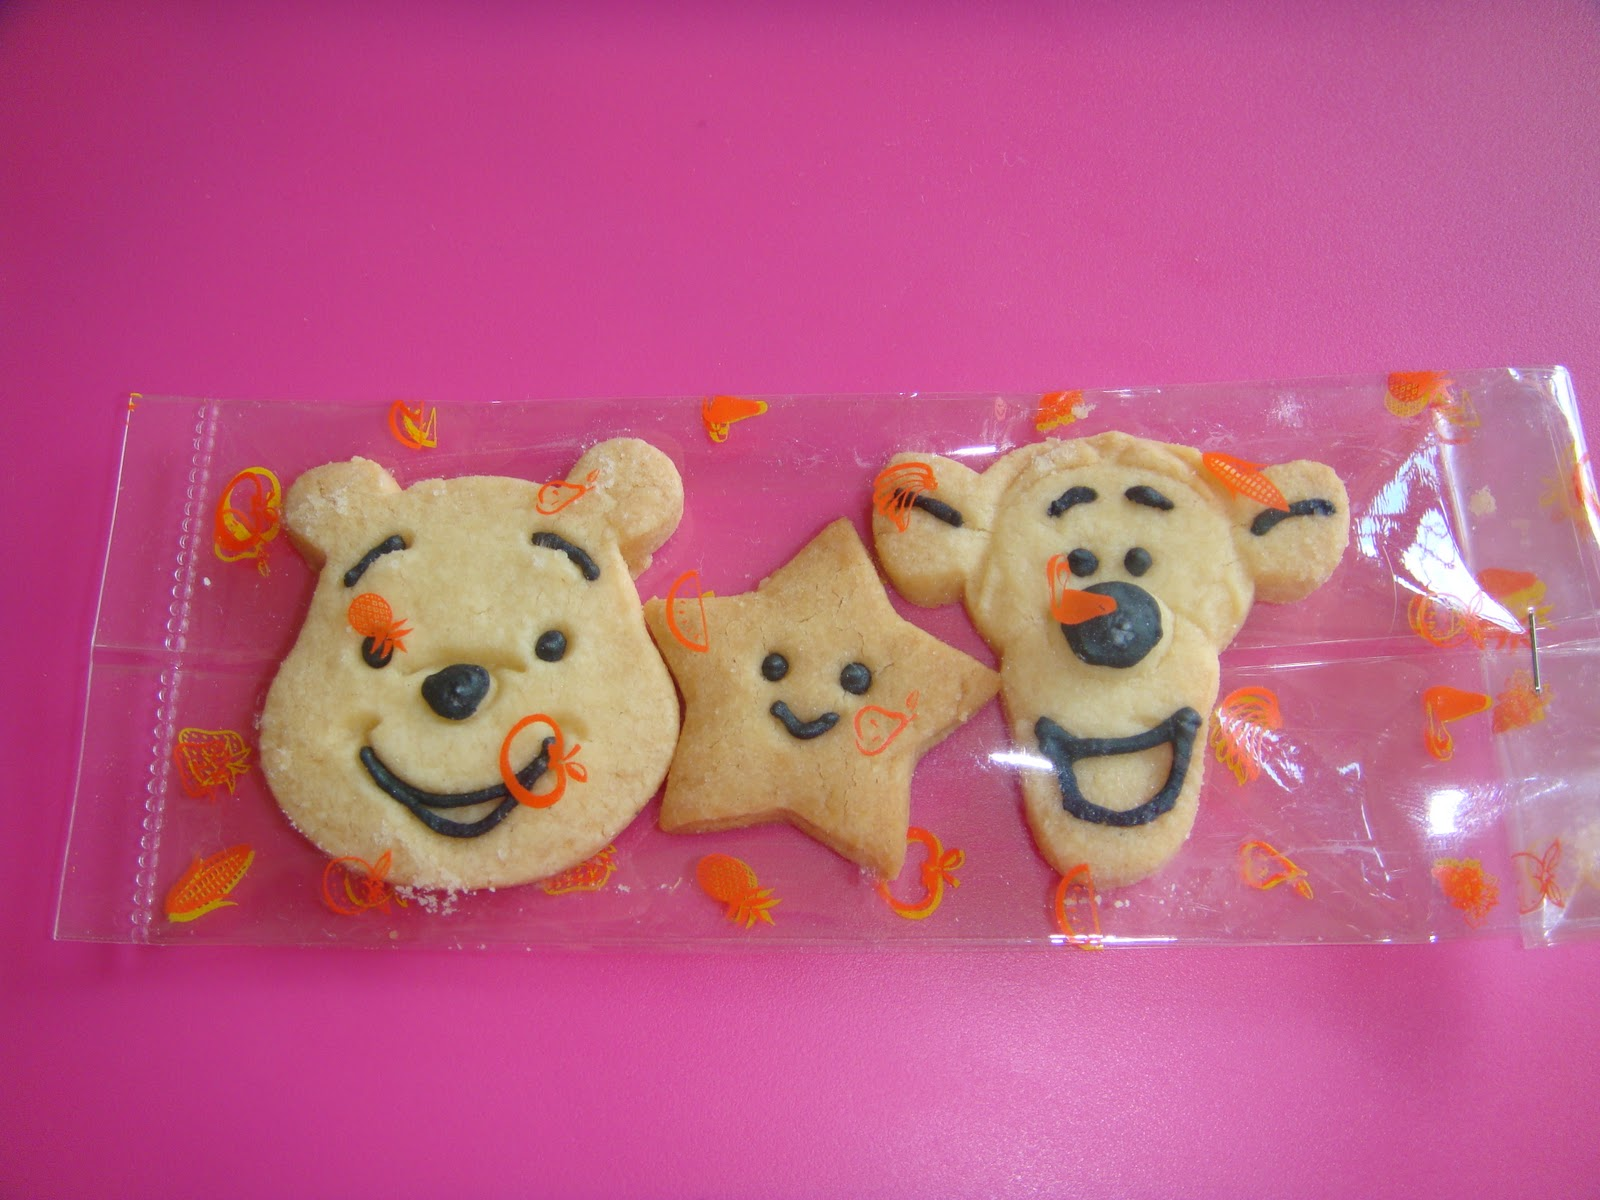 Yummy Baking Pooh Bear Amp Tigger Cookie